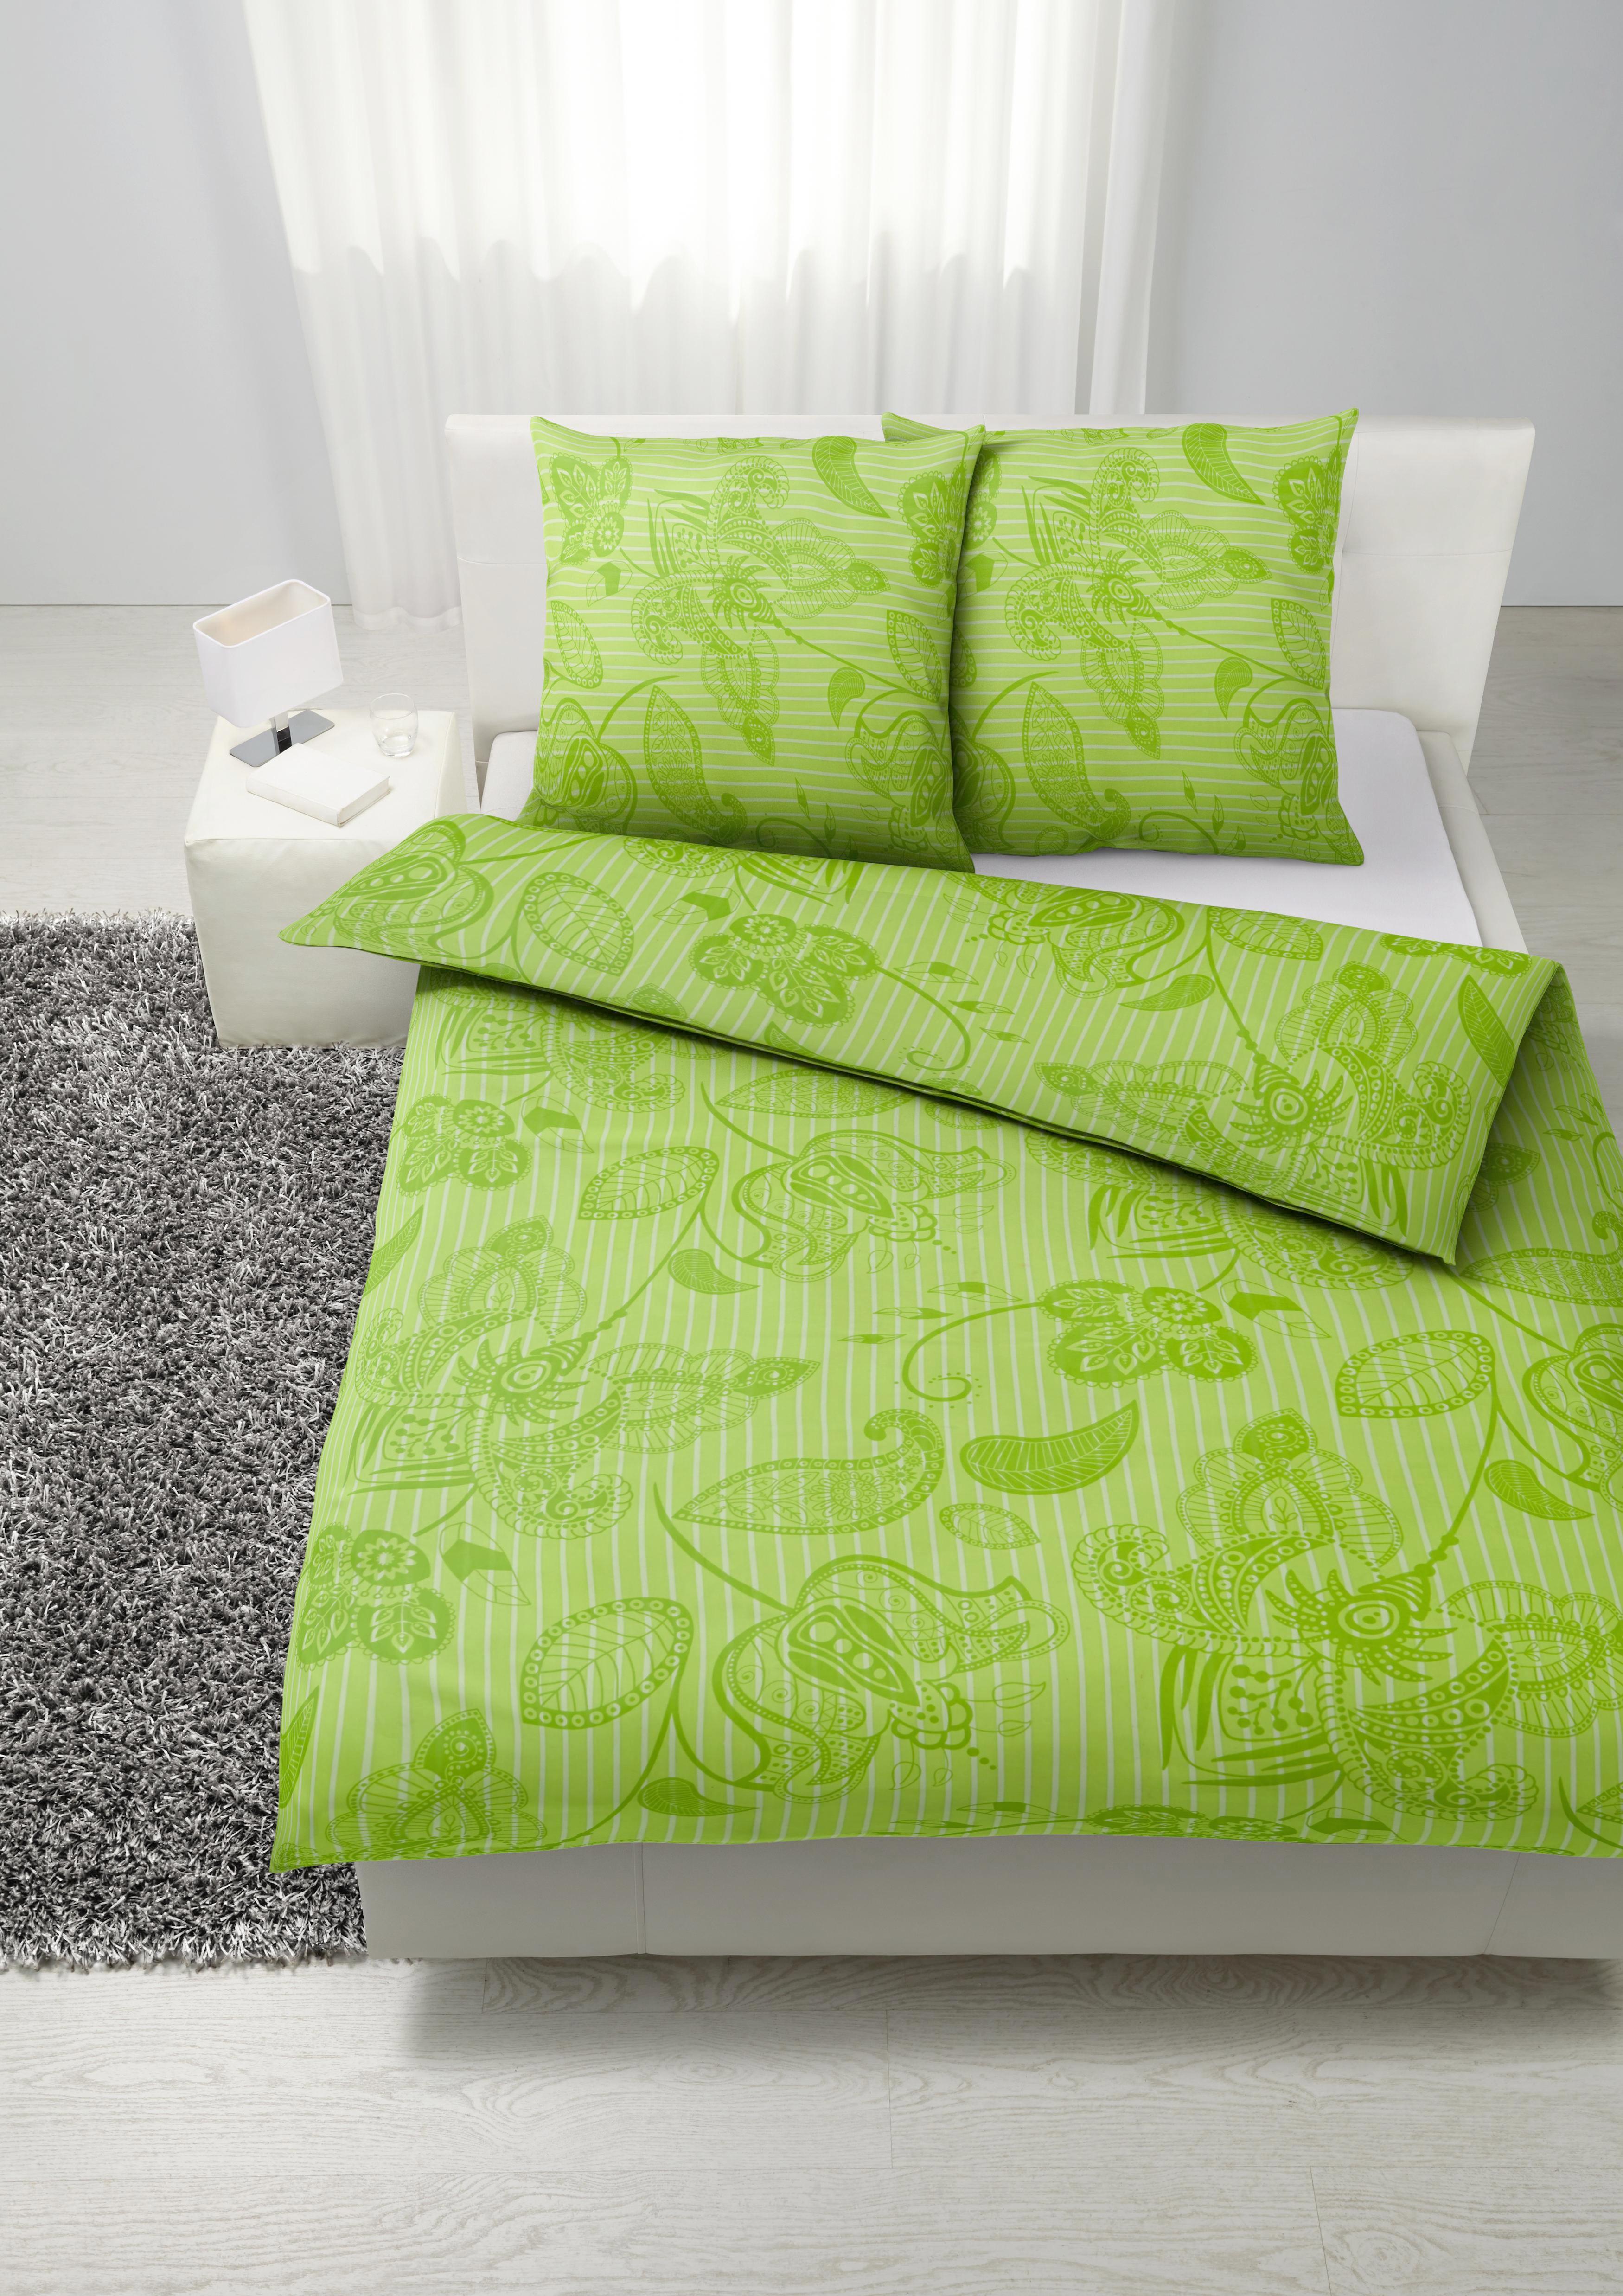 Bettwäsche Marietta XXL, ca. 200x200cm - Grün, Textil (200/200cm) - MÖMAX modern living